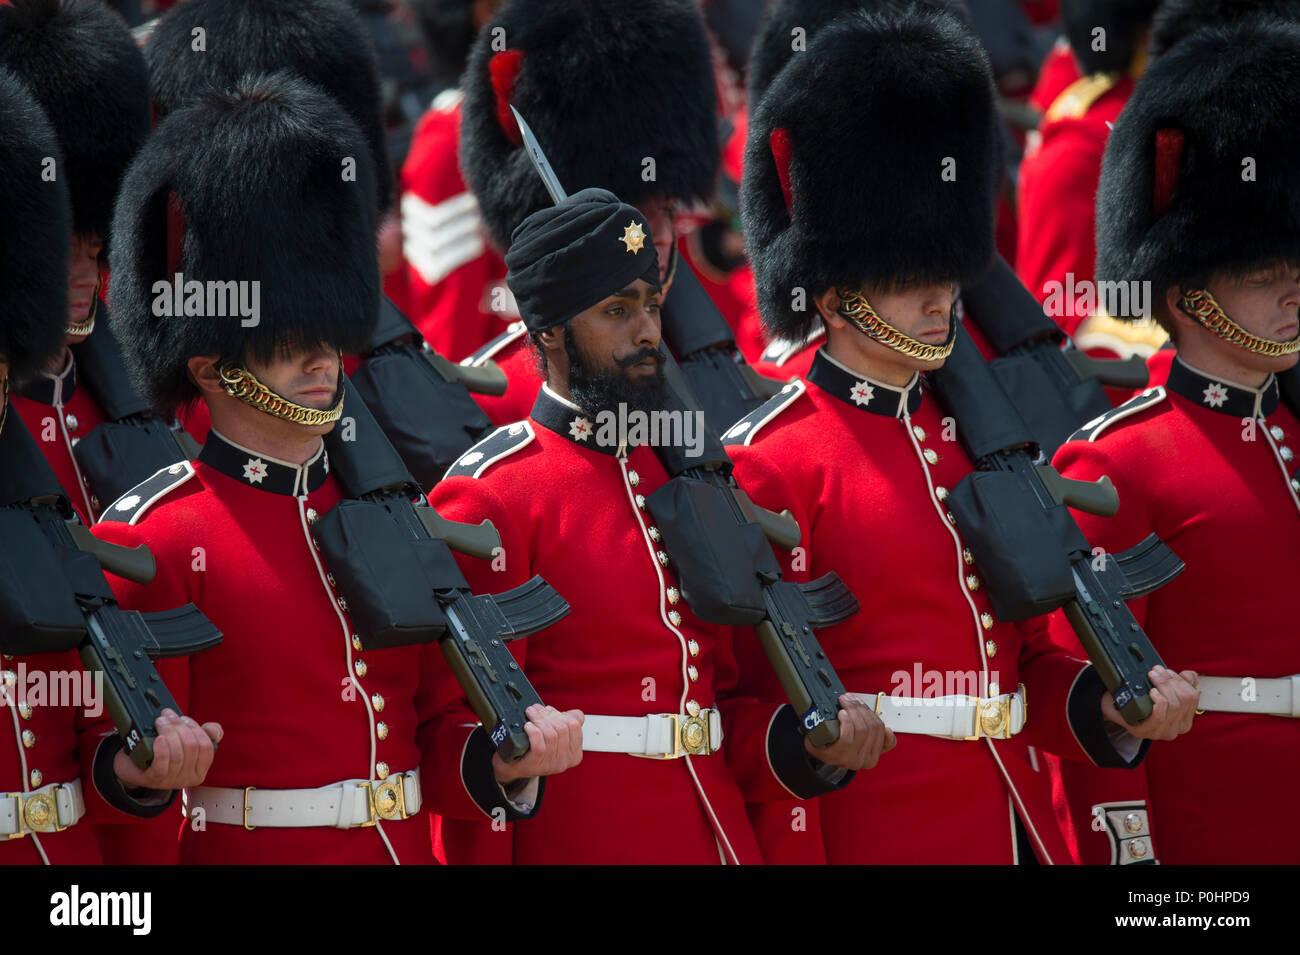 Coldstream Regiment Immagini   Coldstream Regiment Fotos Stock - Alamy 7e0d2e2ce12e